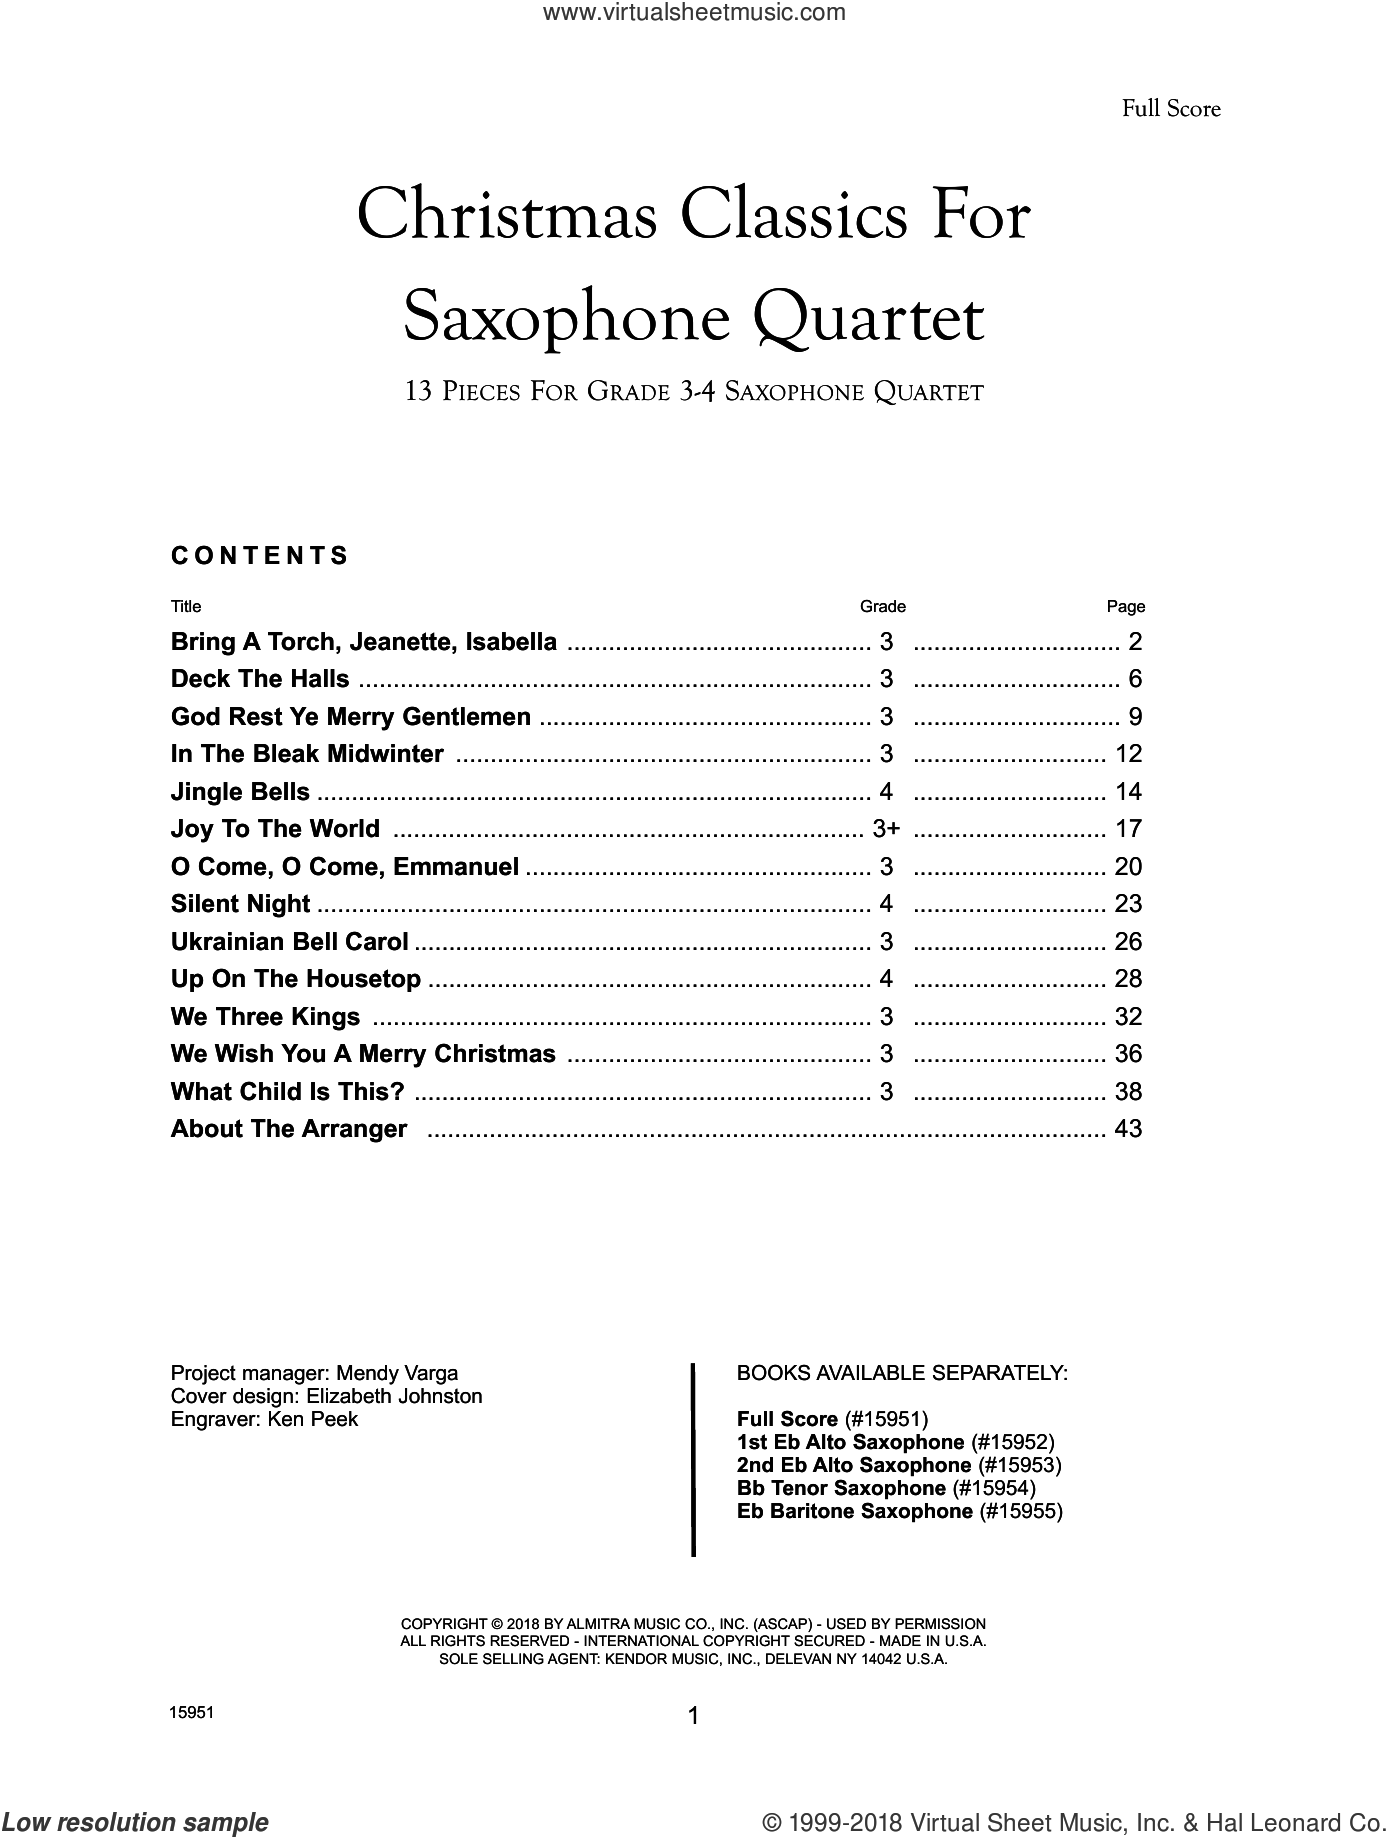 Christmas Classics For Saxophone Quartet - Full Score sheet music for saxophone quartet by Frank J. Halferty, intermediate skill level